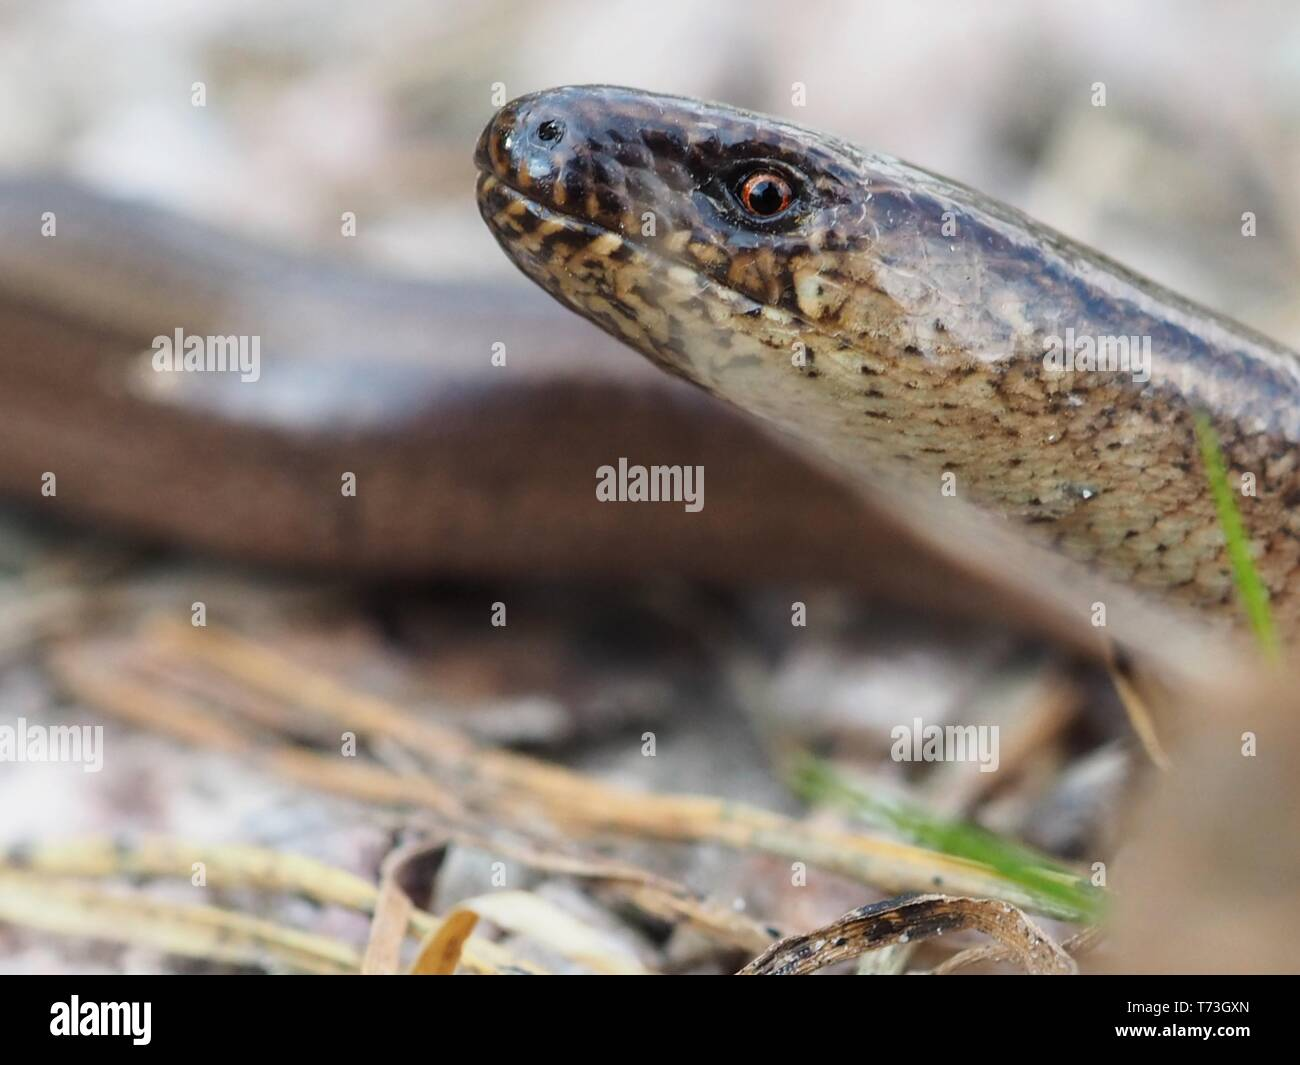 Slow worm close up - Stock Image